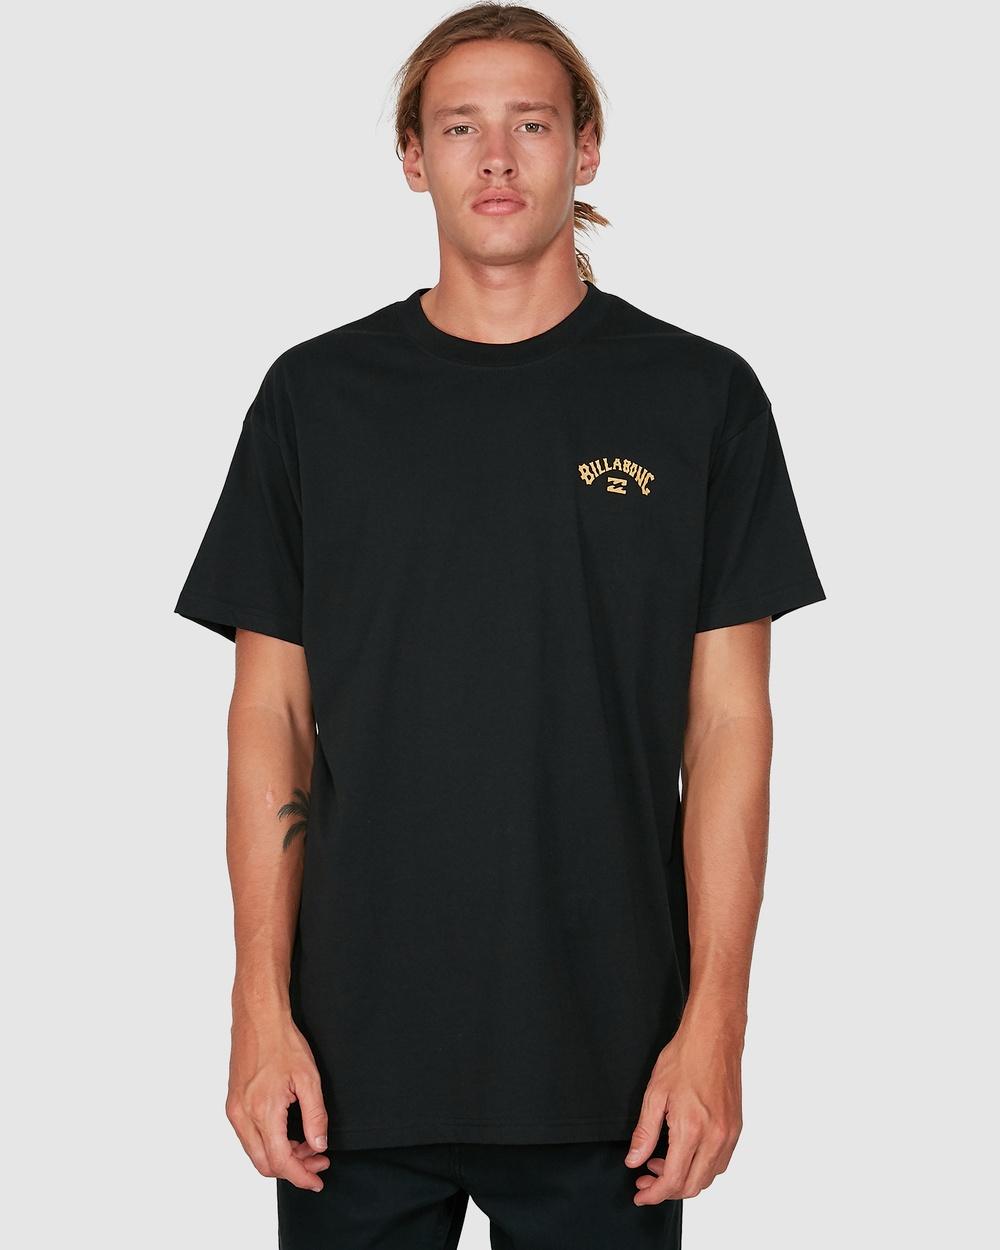 Billabong - Wave Arch Short Sleeve Tee - T-Shirts & Singlets (BLACK) Wave Arch Short Sleeve Tee